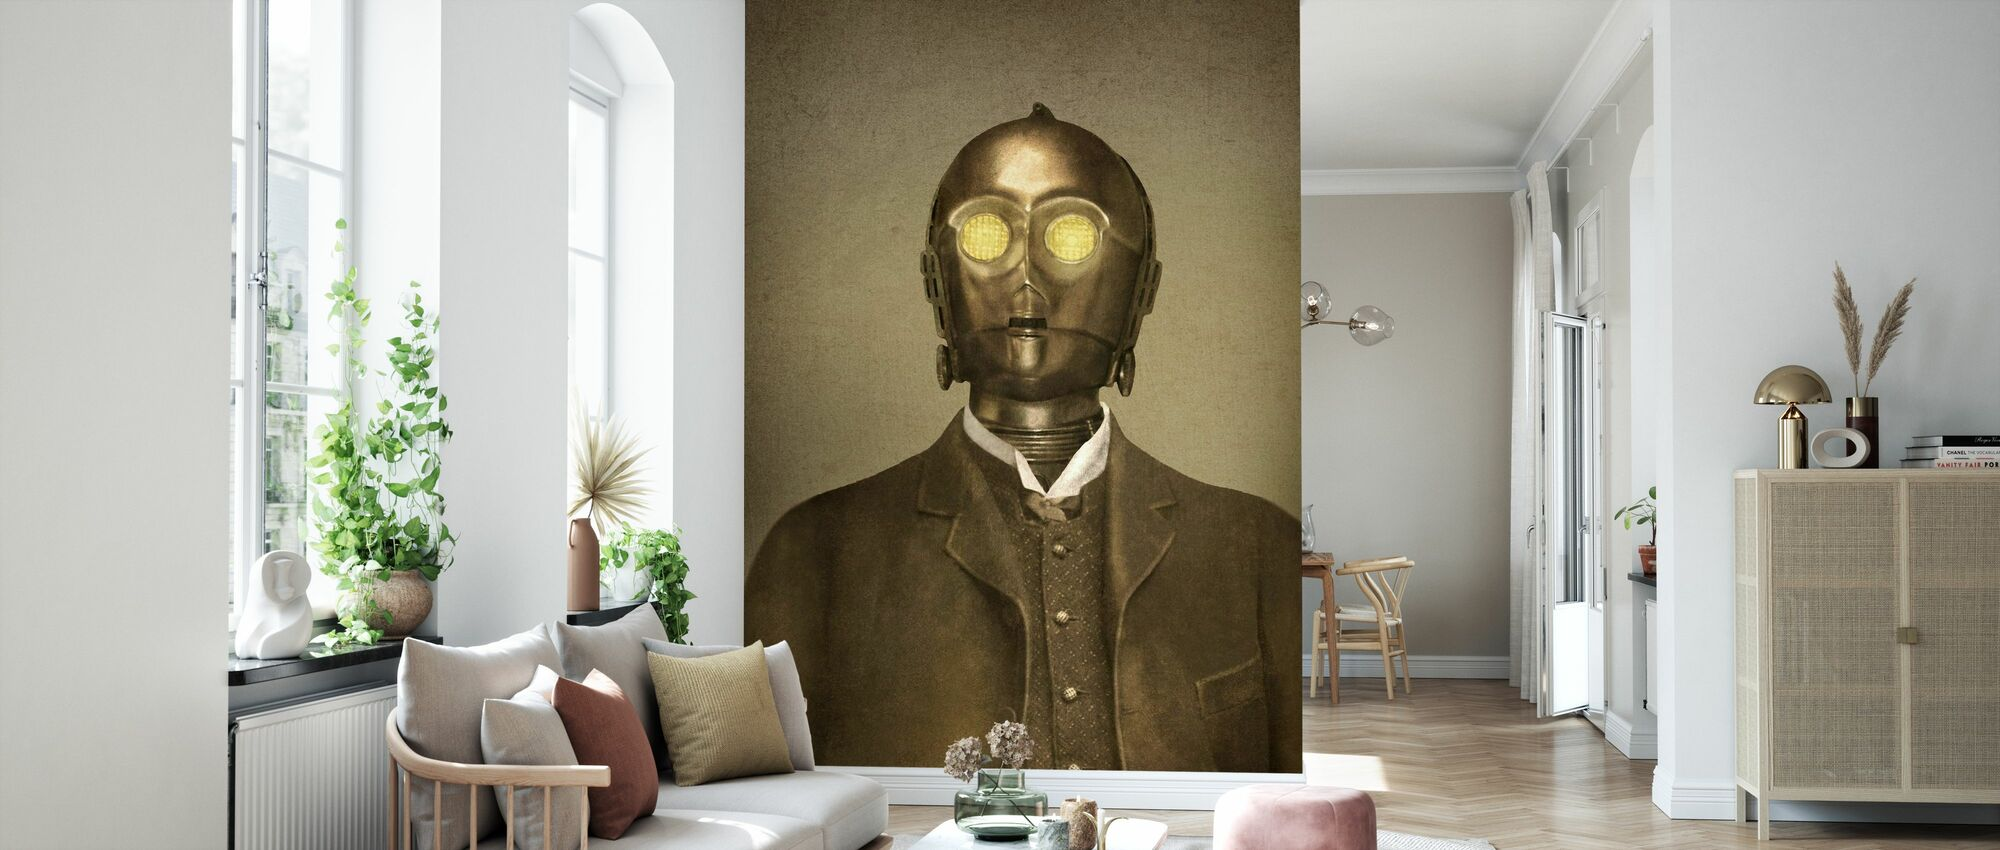 Victorian Wars Baron Von 3PO - Wallpaper - Living Room